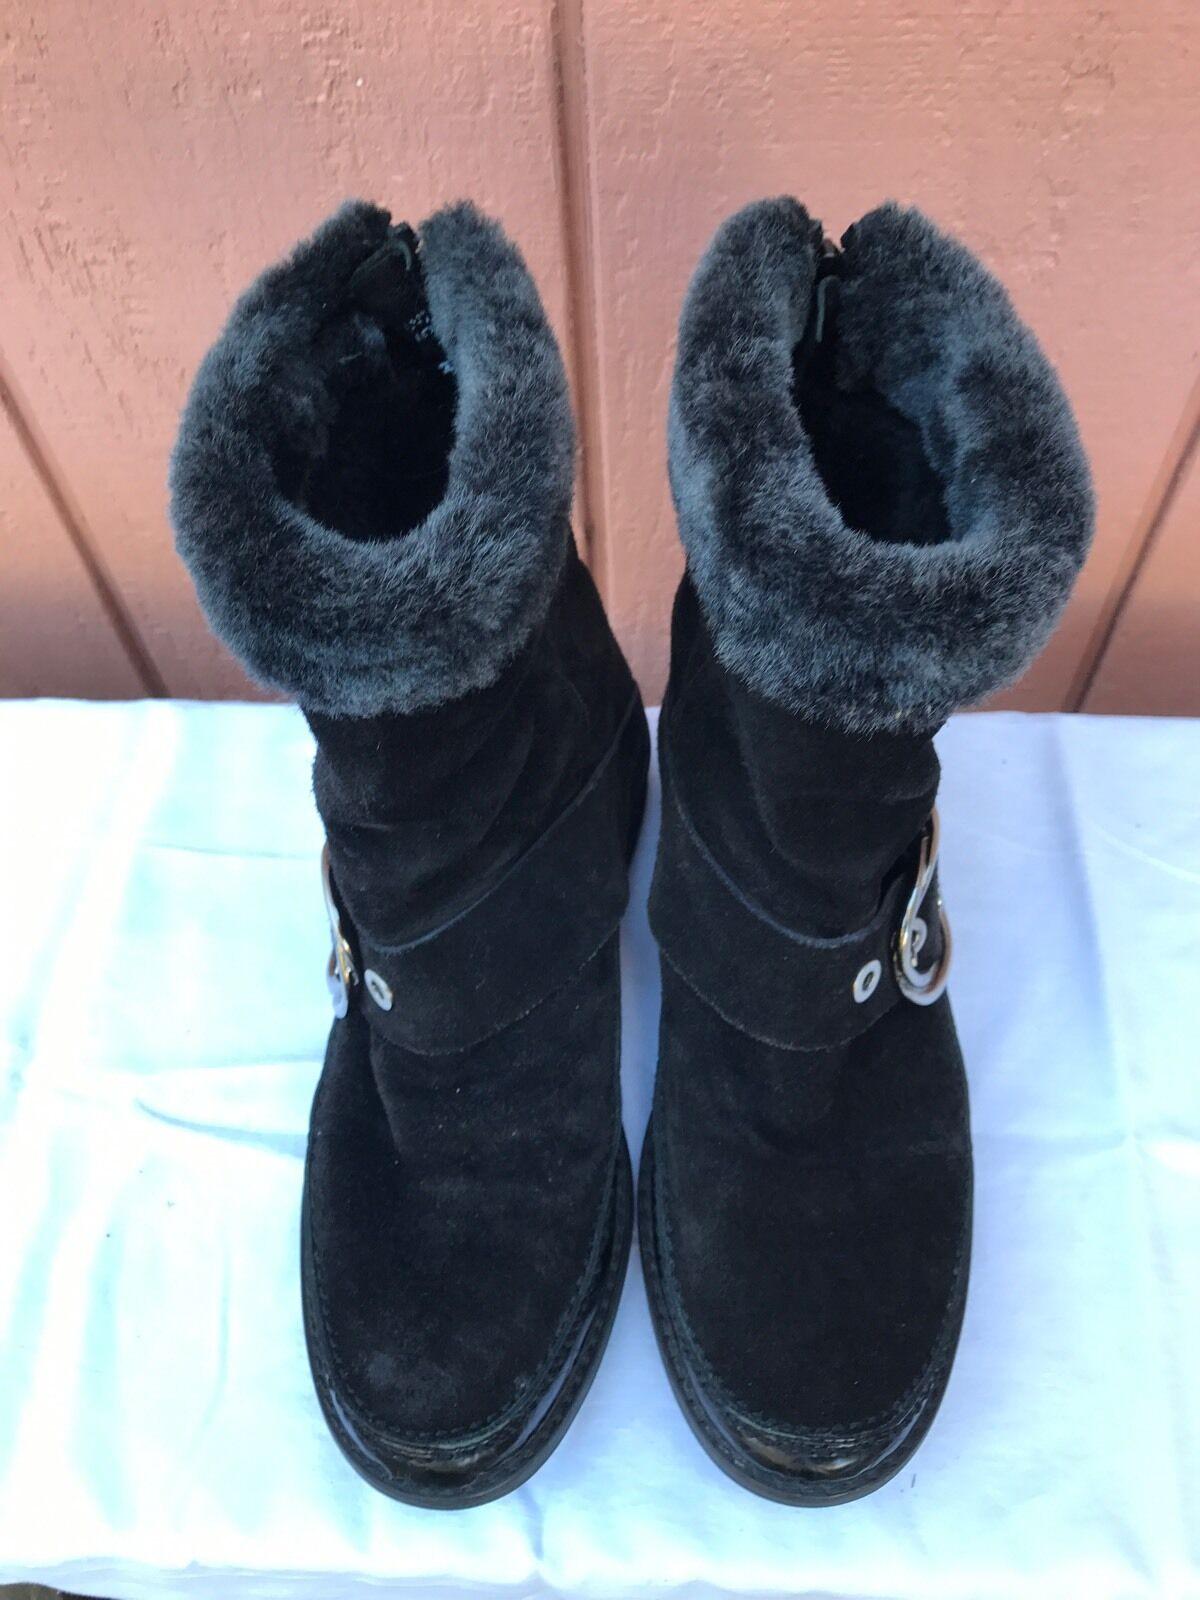 0b61bb216c1 EUC 389 STUART WEITZMAN Fur Black Suede Winter Boots Boots Boots ...